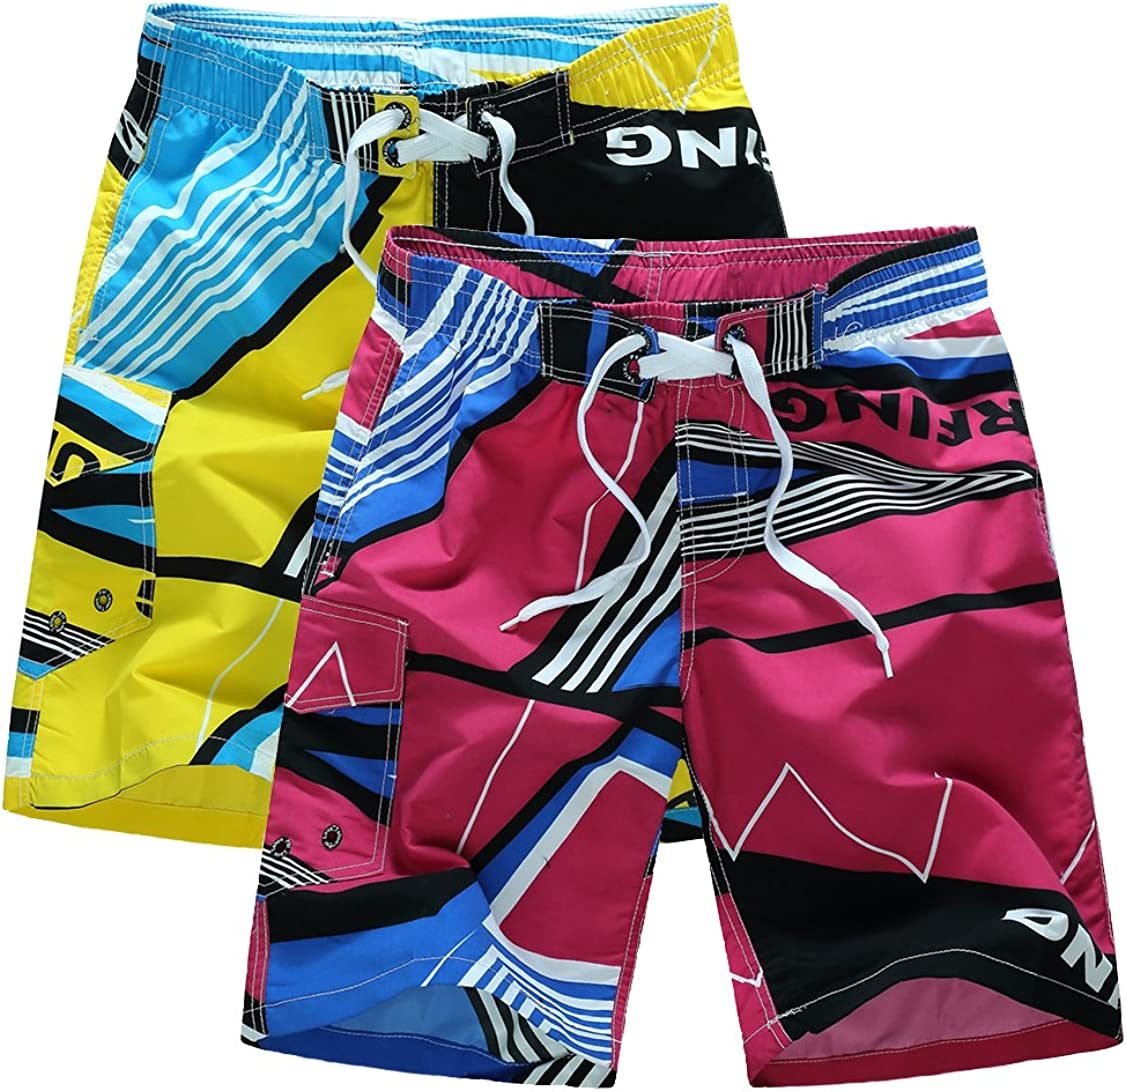 Kolongvangie Men's Casual Colorful Art Print Beach Boardshorts Quick Dry Swim Trunks with Mesh Lining